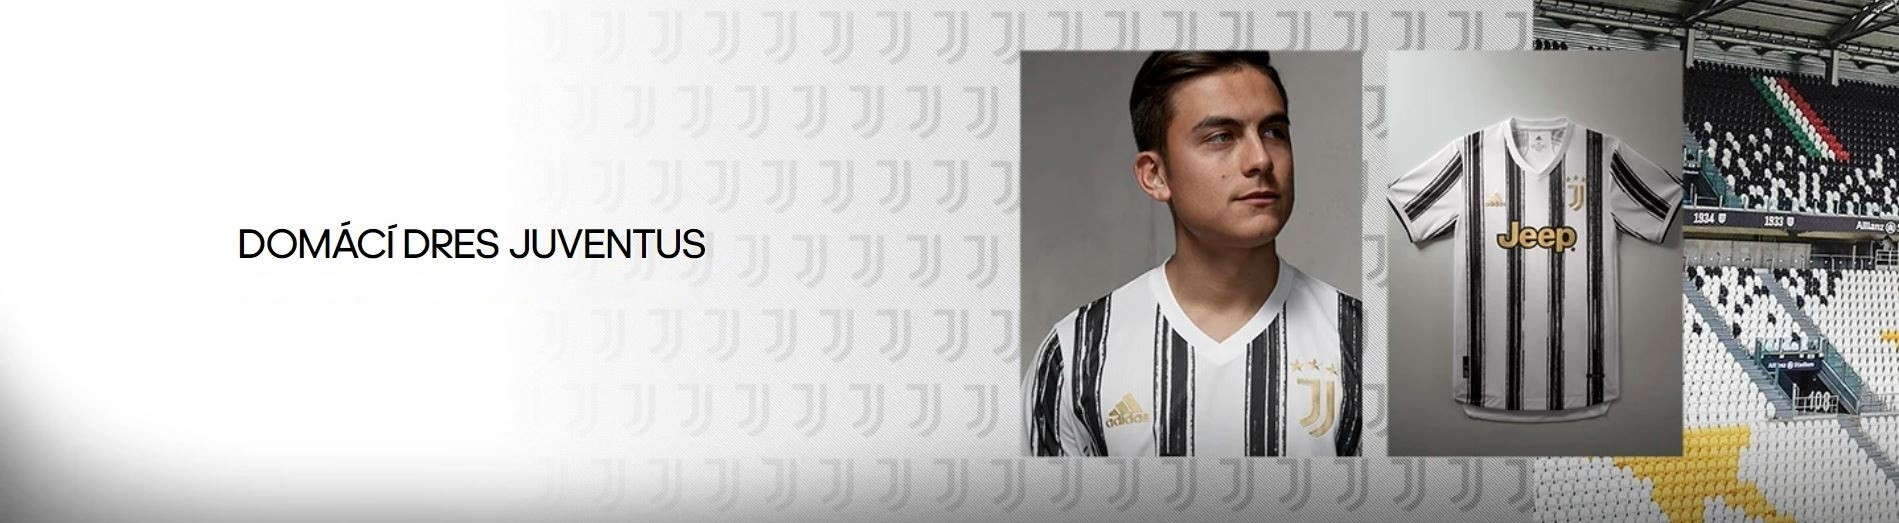 Juventus domácí dres 2020/21